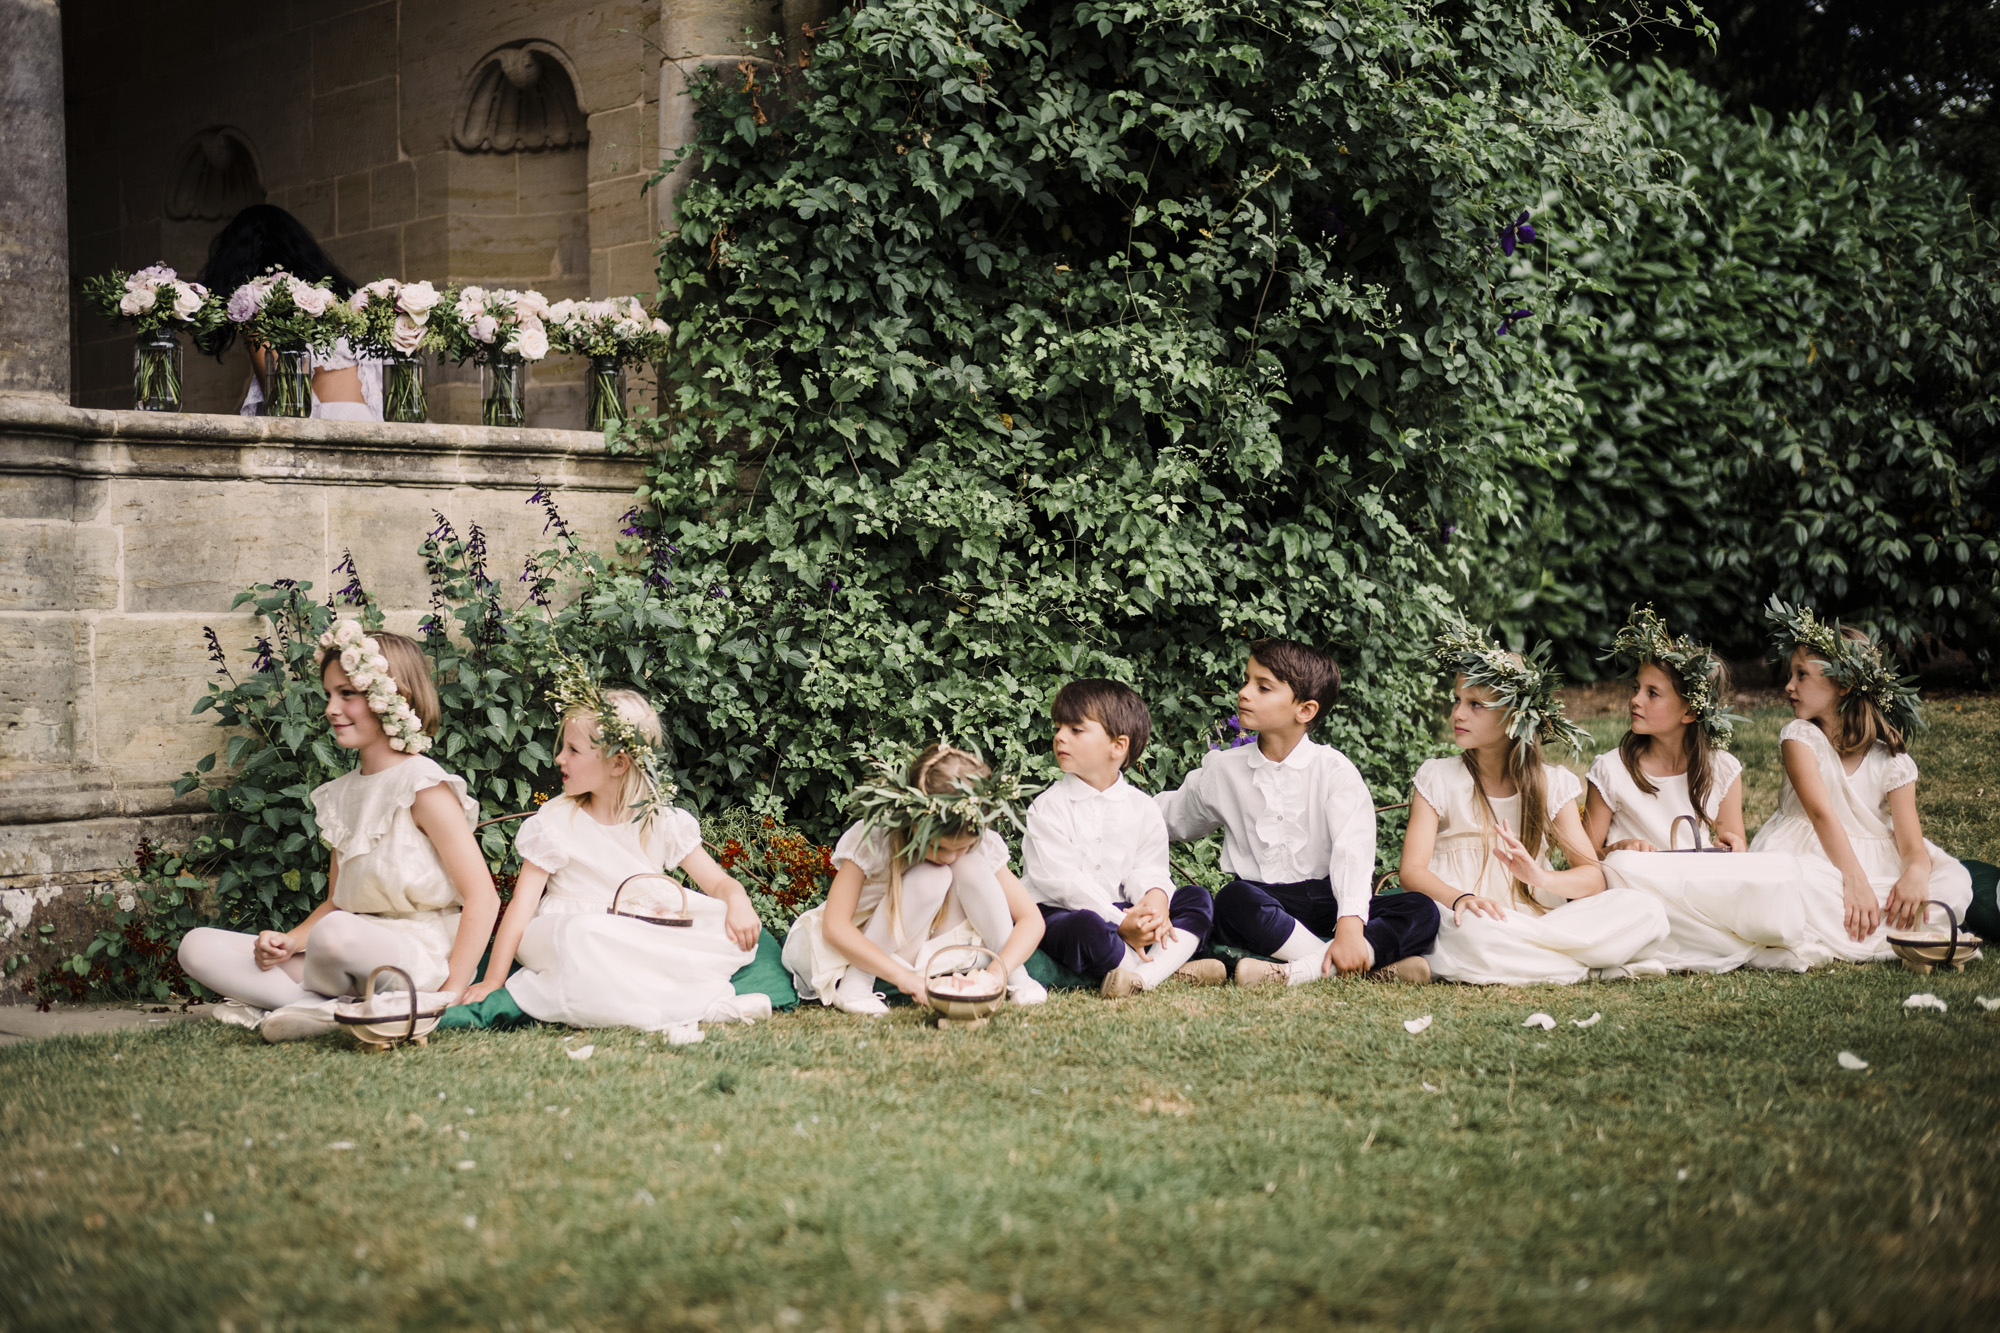 Jaz-Kate-Beaumont-Oyster-Silk-Bias-Cut-Wedding-Gown-Larkspur-Lace-Top-Sussex-Wedding-7.jpg